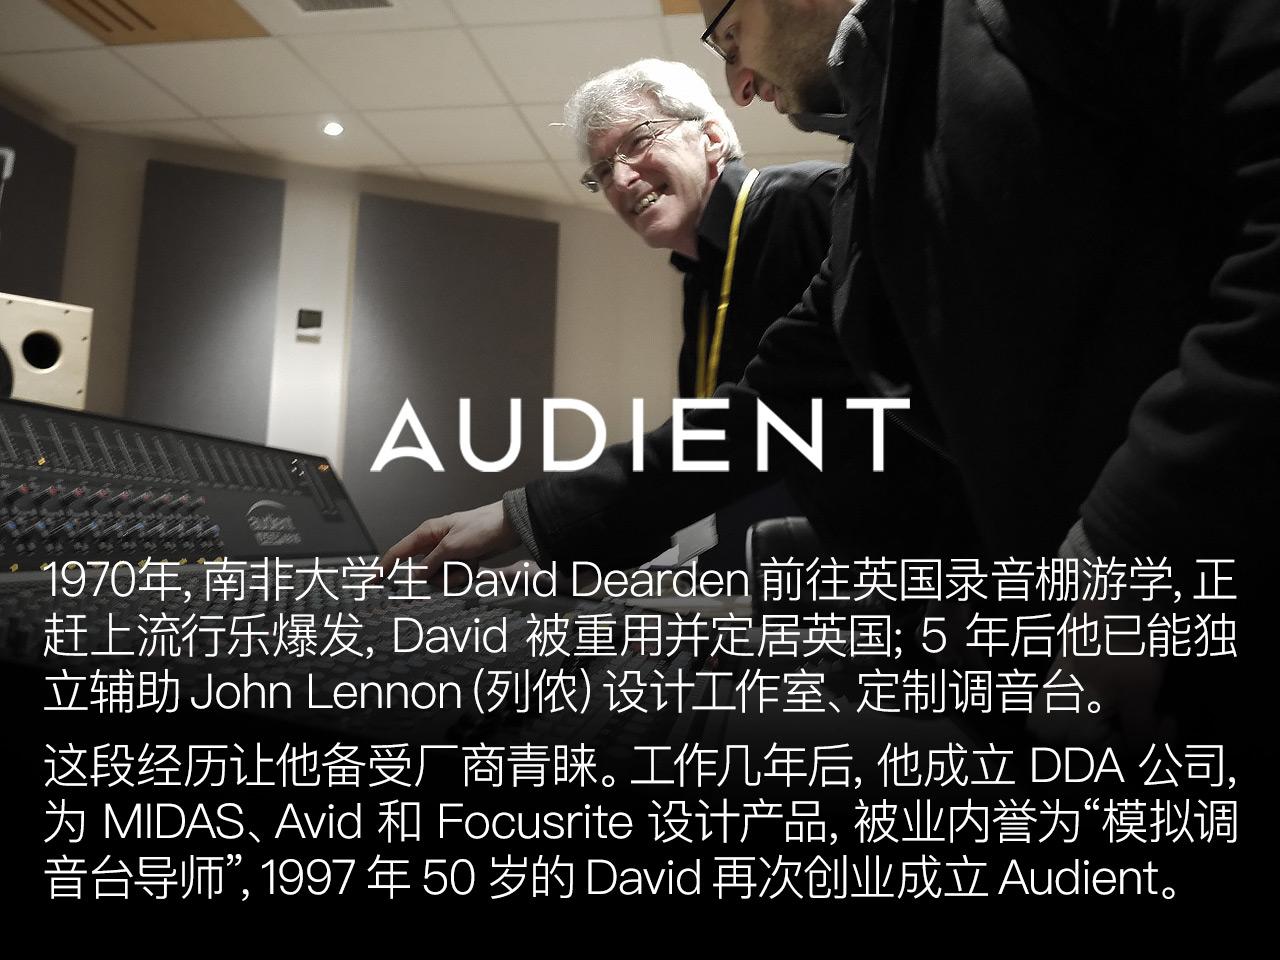 Audient_History.jpg